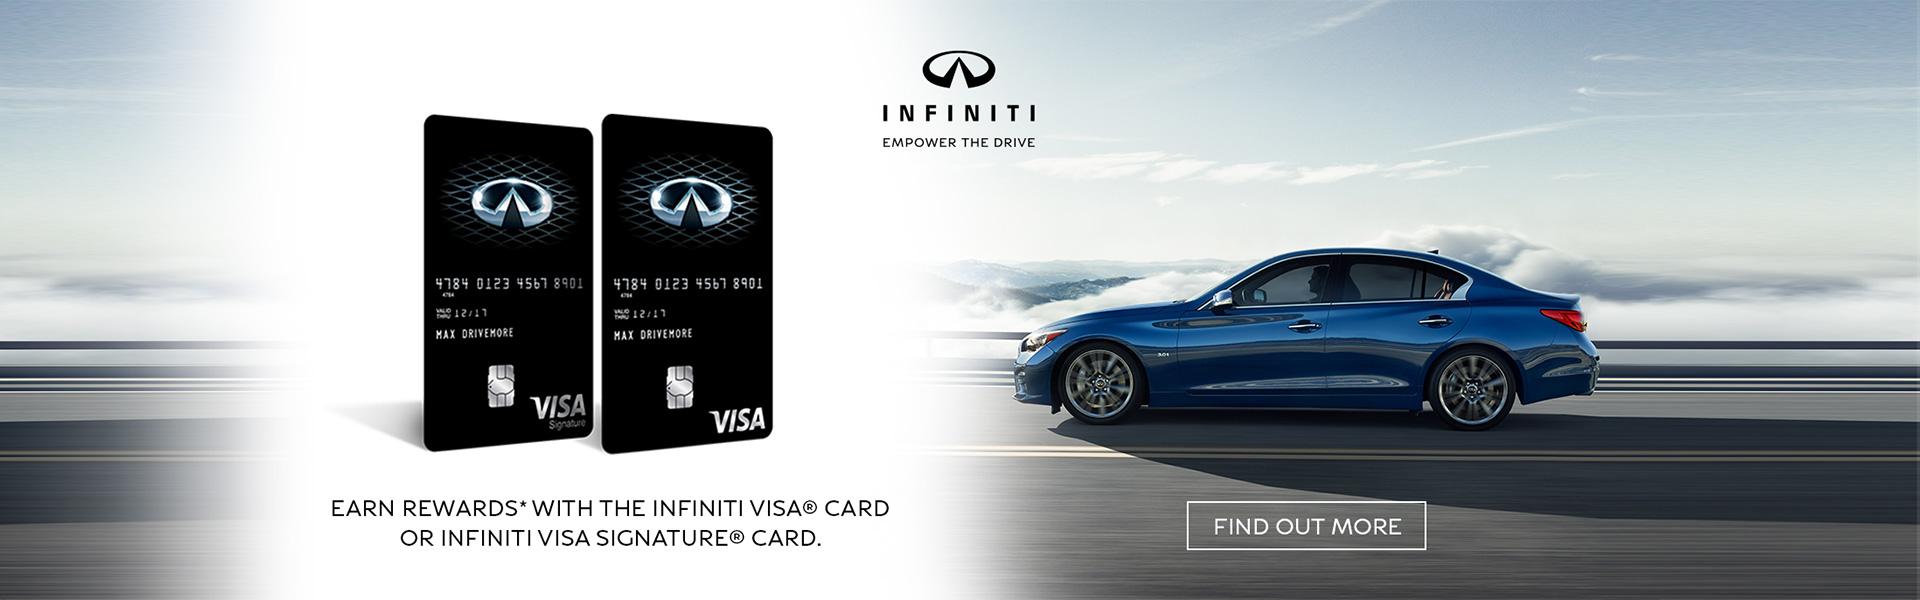 Infiniti Rewards